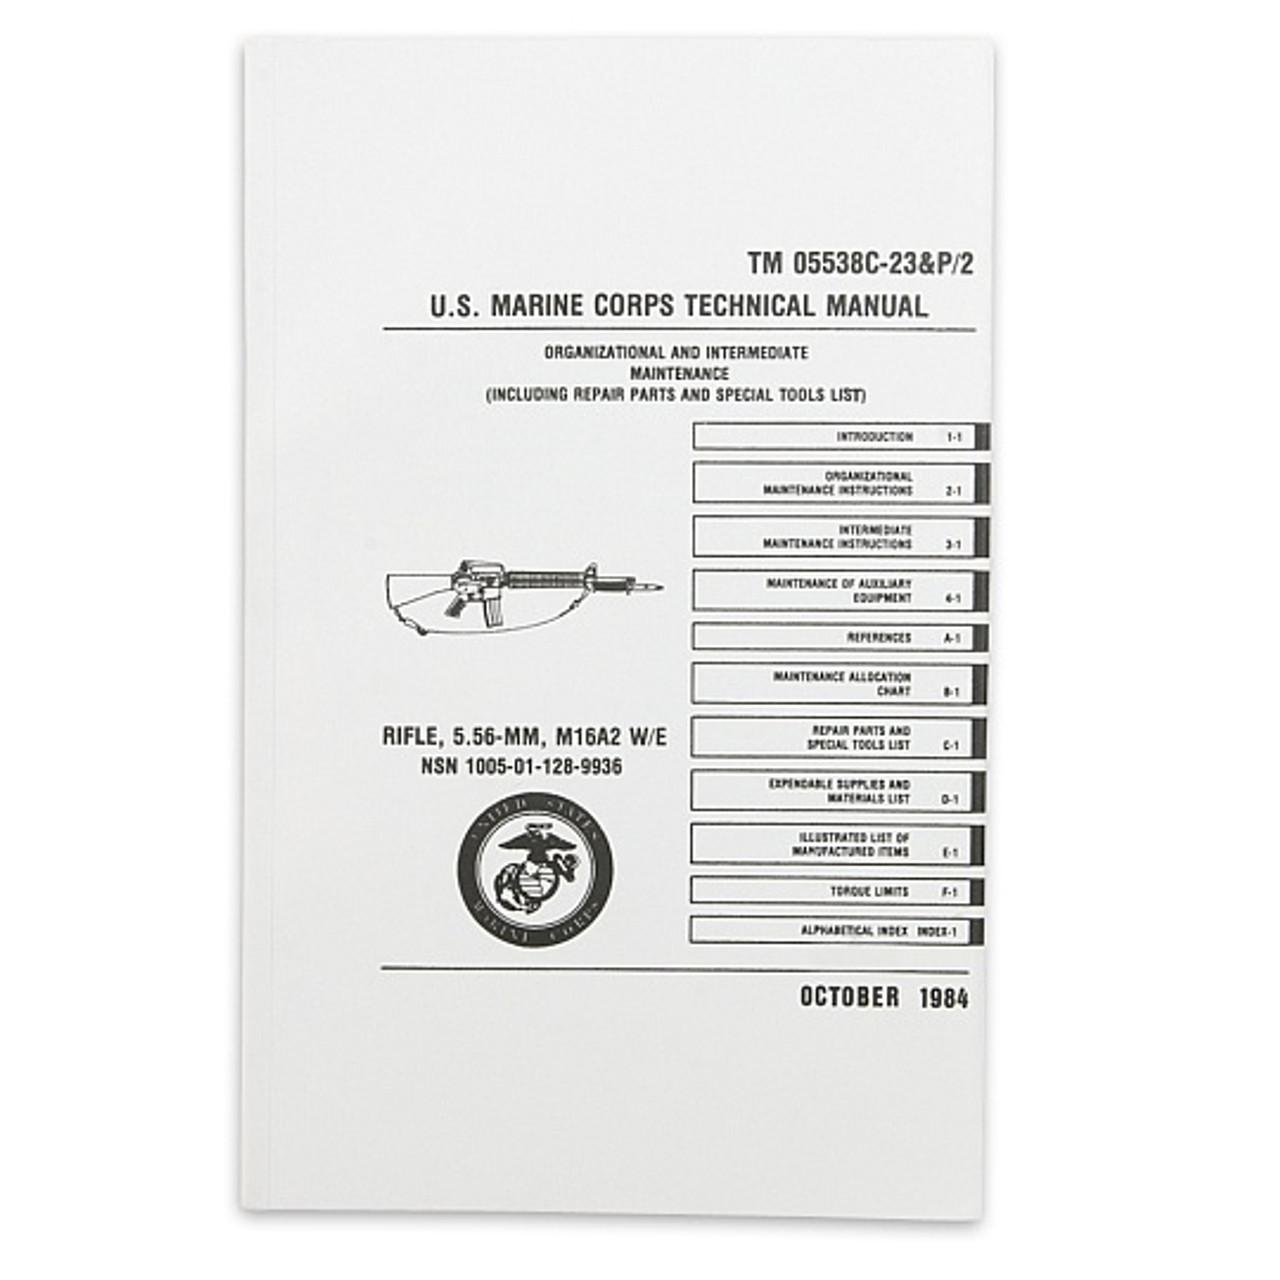 us marine corps technical manual rifle 5 56 mm m16a2 tm 05538c rh allpredatorcalls com Military M 16 A2 m16a2 technical manual pdf